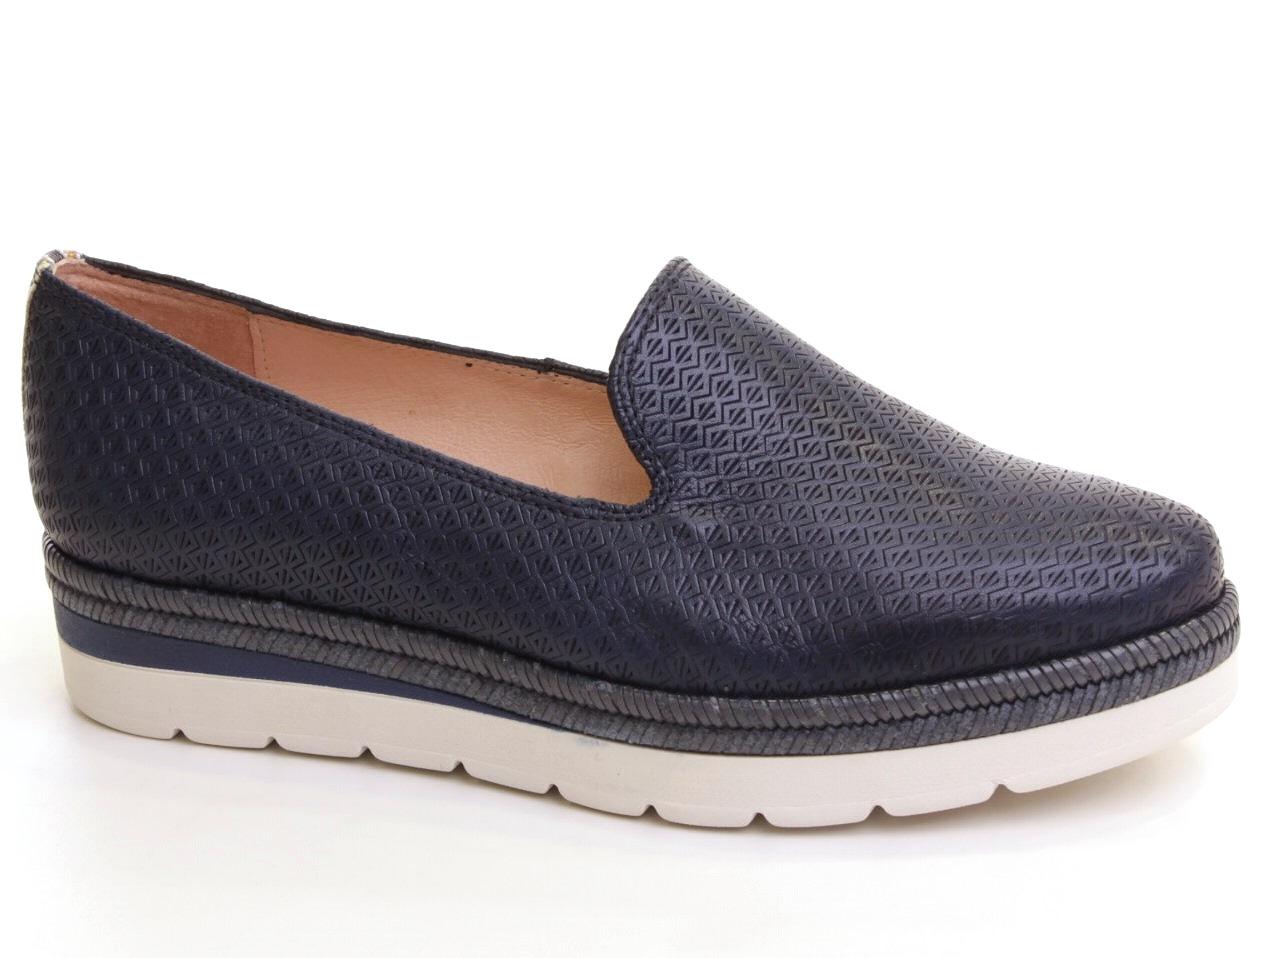 Flat Shoes, Ballerinas, Mocassins Hispanitas - 165 HV62734